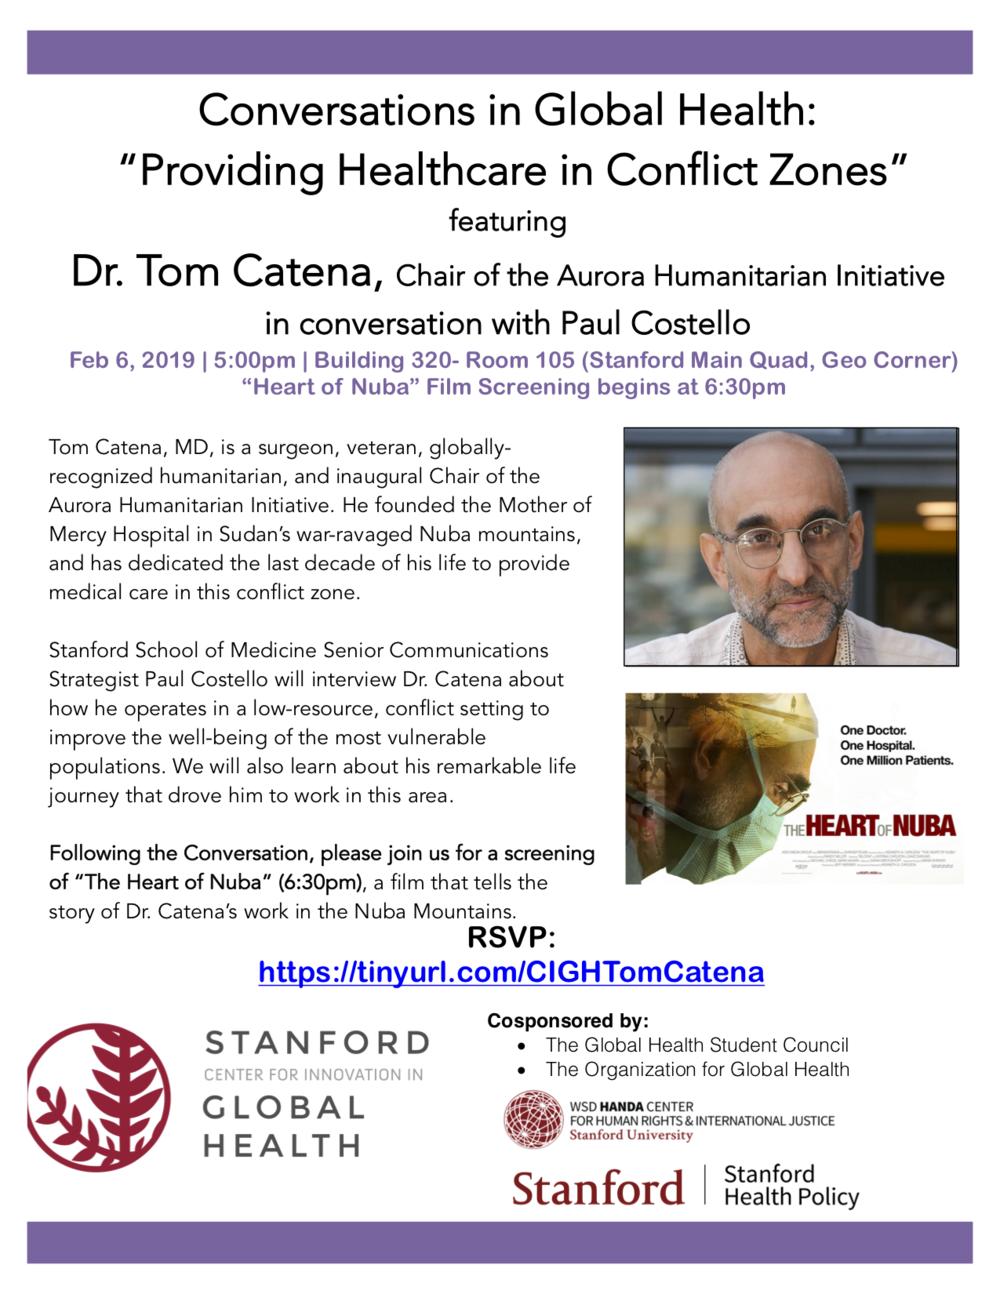 Providing Healthcare in Conflict Zones - Feb 6, 2019